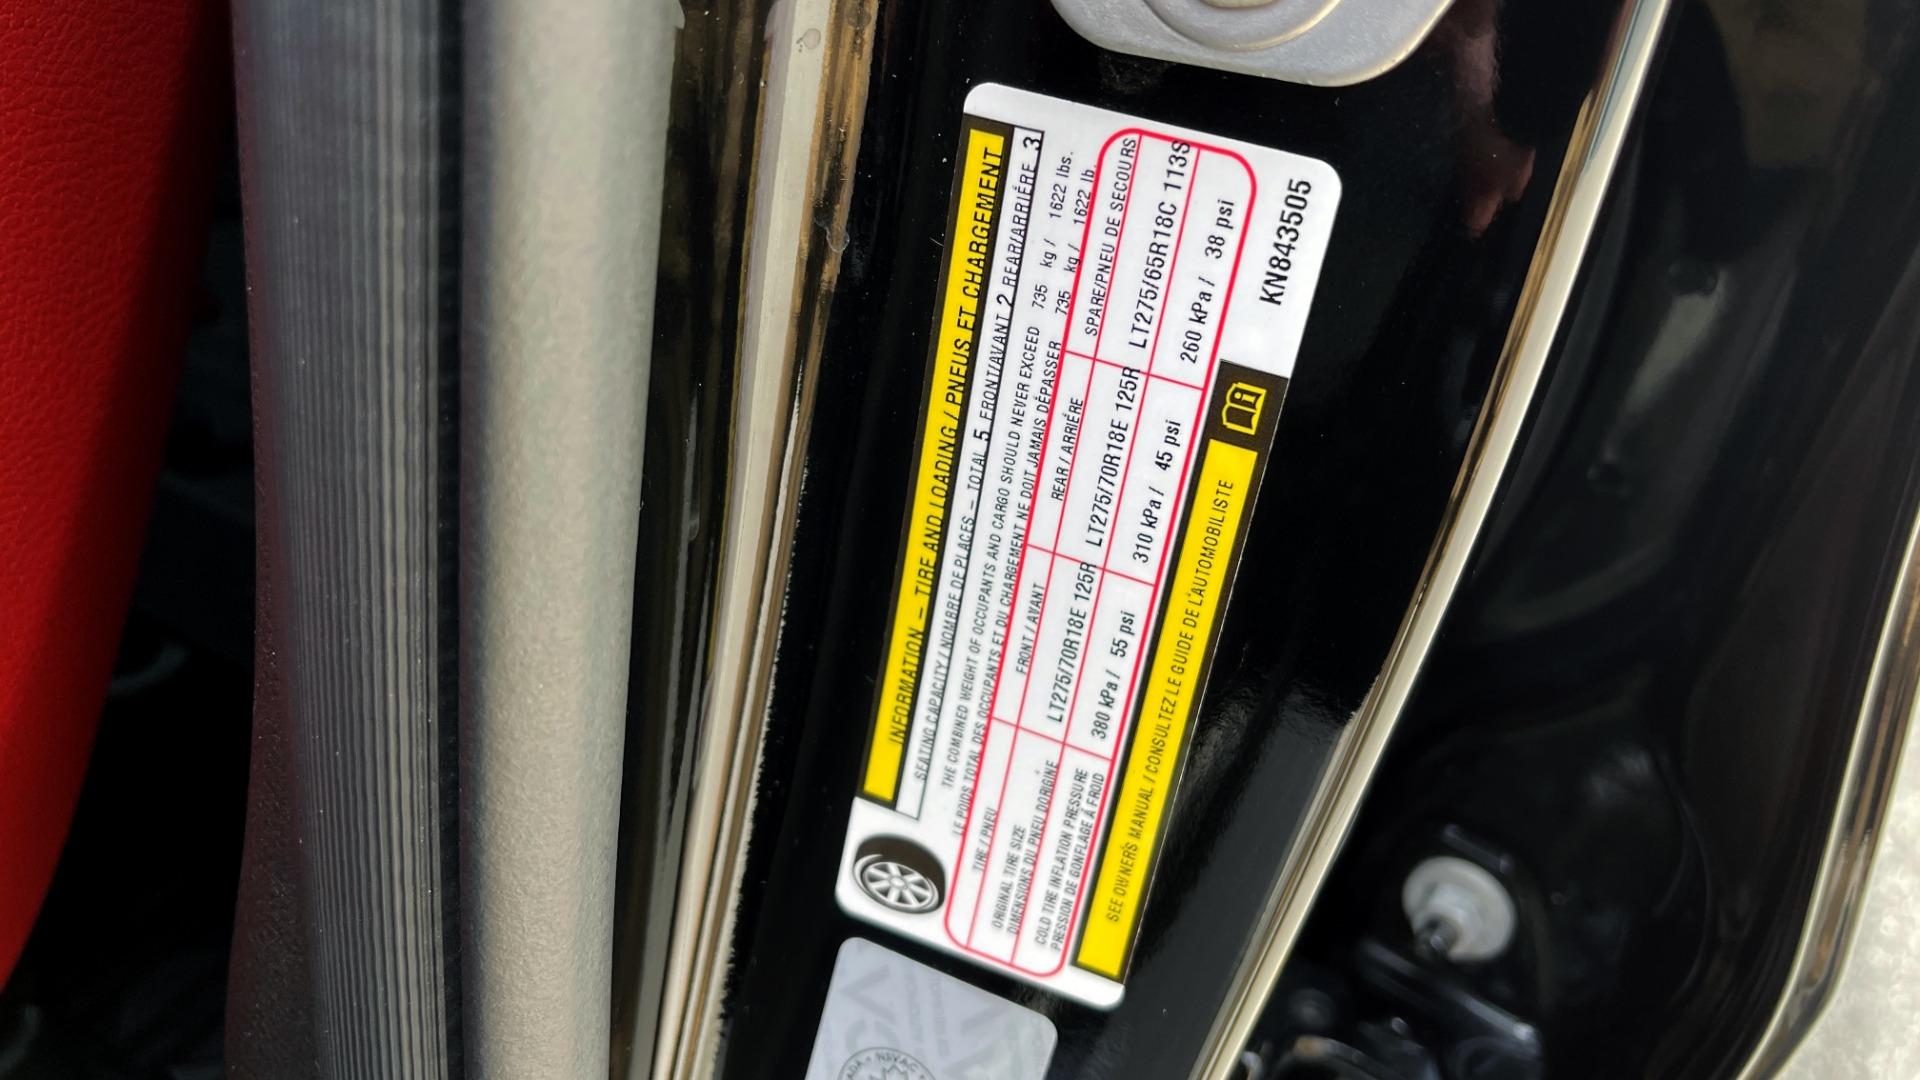 Used 2019 Ram 1500 REBEL QUADCAB 4X4 / 5.7L HEMI / 8-SPD AUTO / REMOTE START / PARK ASSIST for sale $44,495 at Formula Imports in Charlotte NC 28227 80